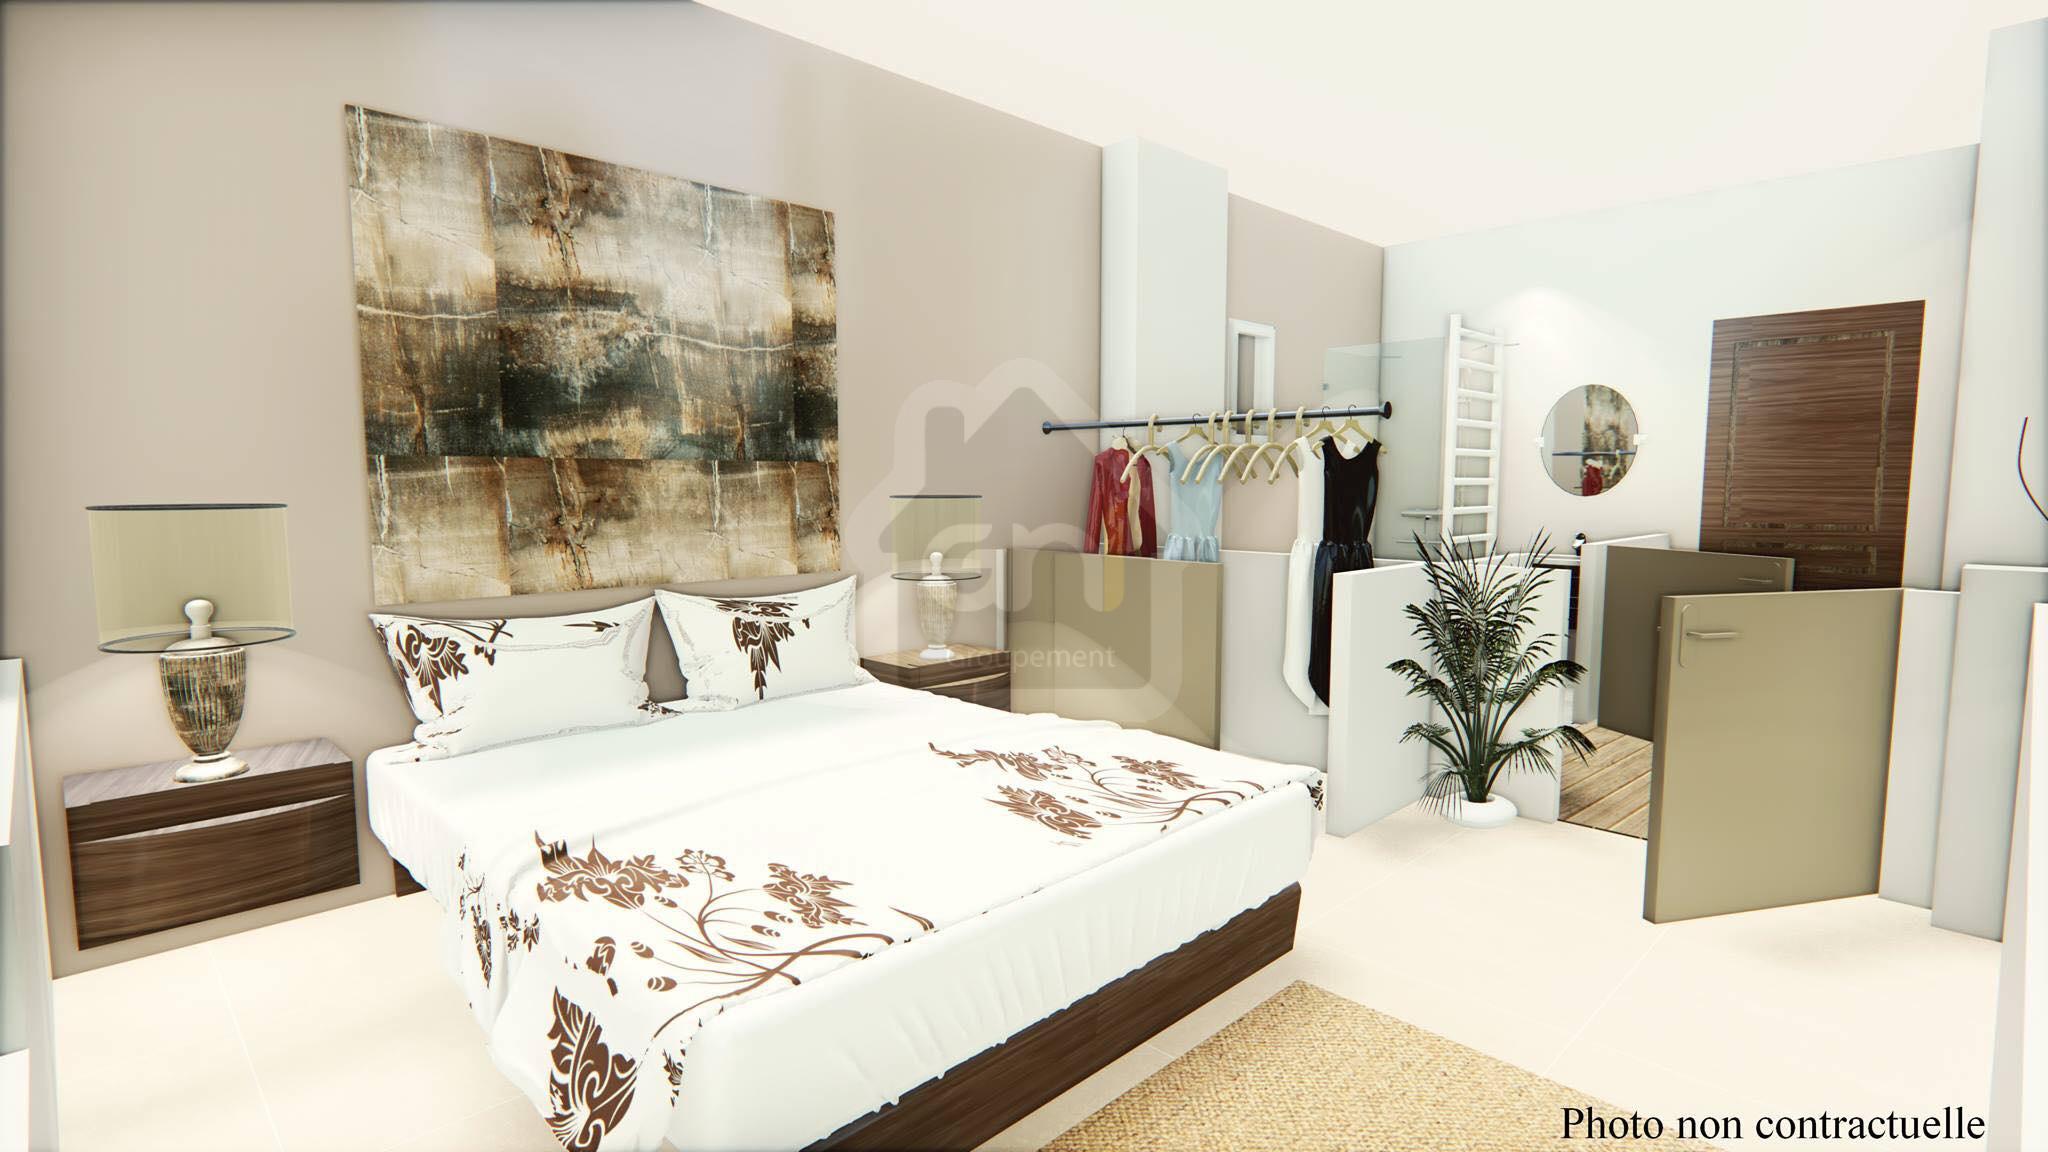 Vente Appartement Neuf T2 Solenzara Corse Patrimoine